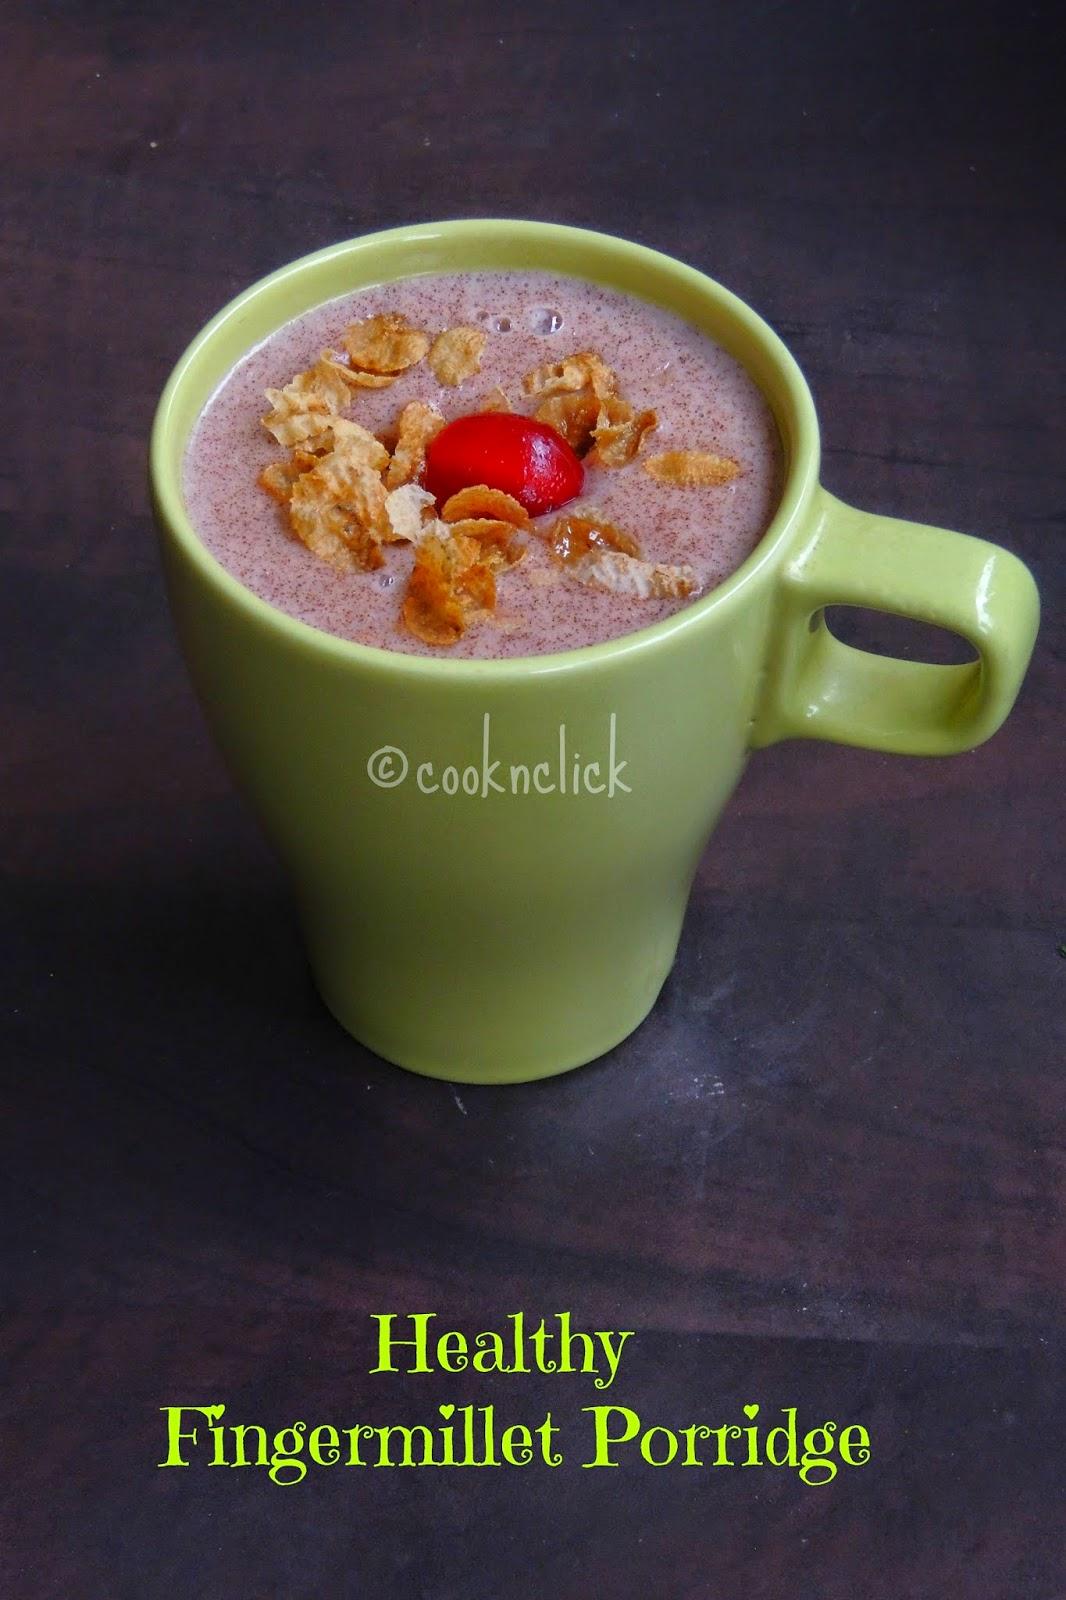 Sprouted ragi porridge, breakfast ragi porridge,Healthy fingermillet porridge, ragi malt